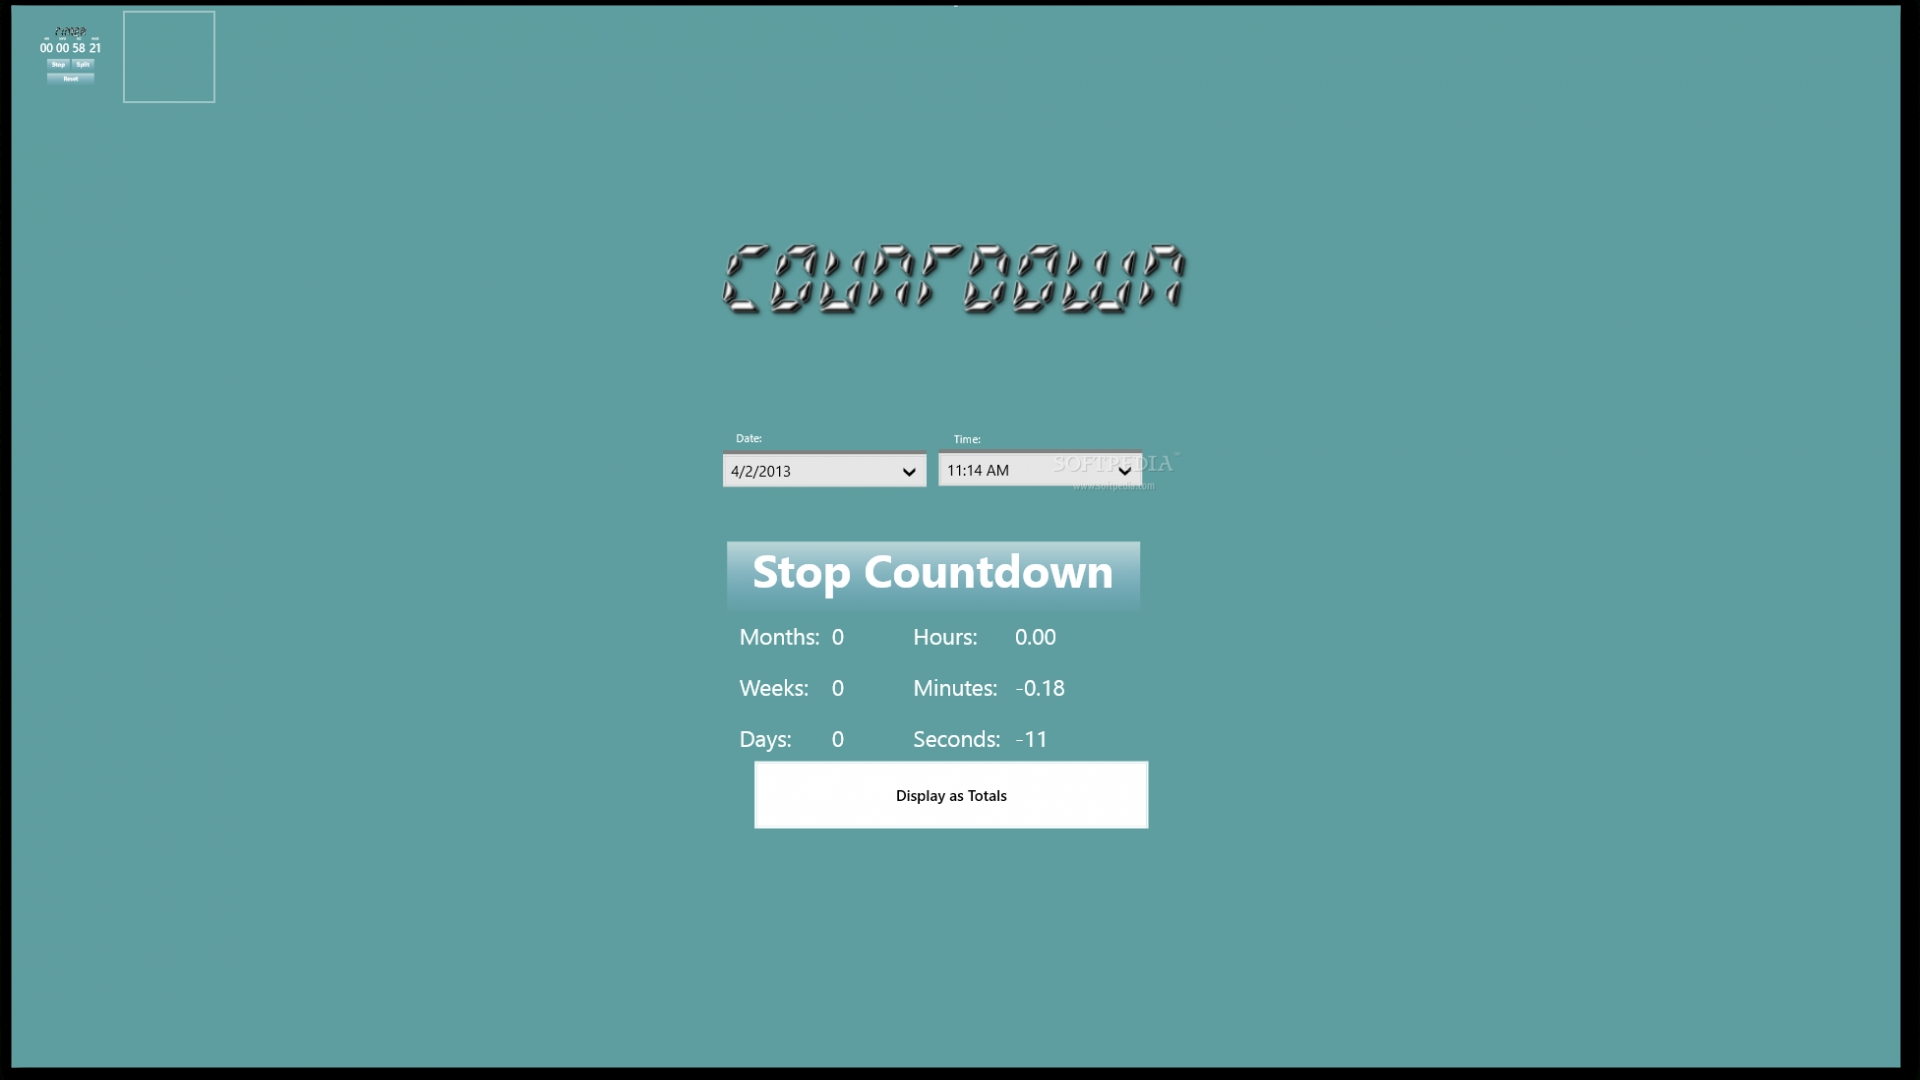 Free Download Countdown Timer 600 X 314 Jpeg 53kb Minus